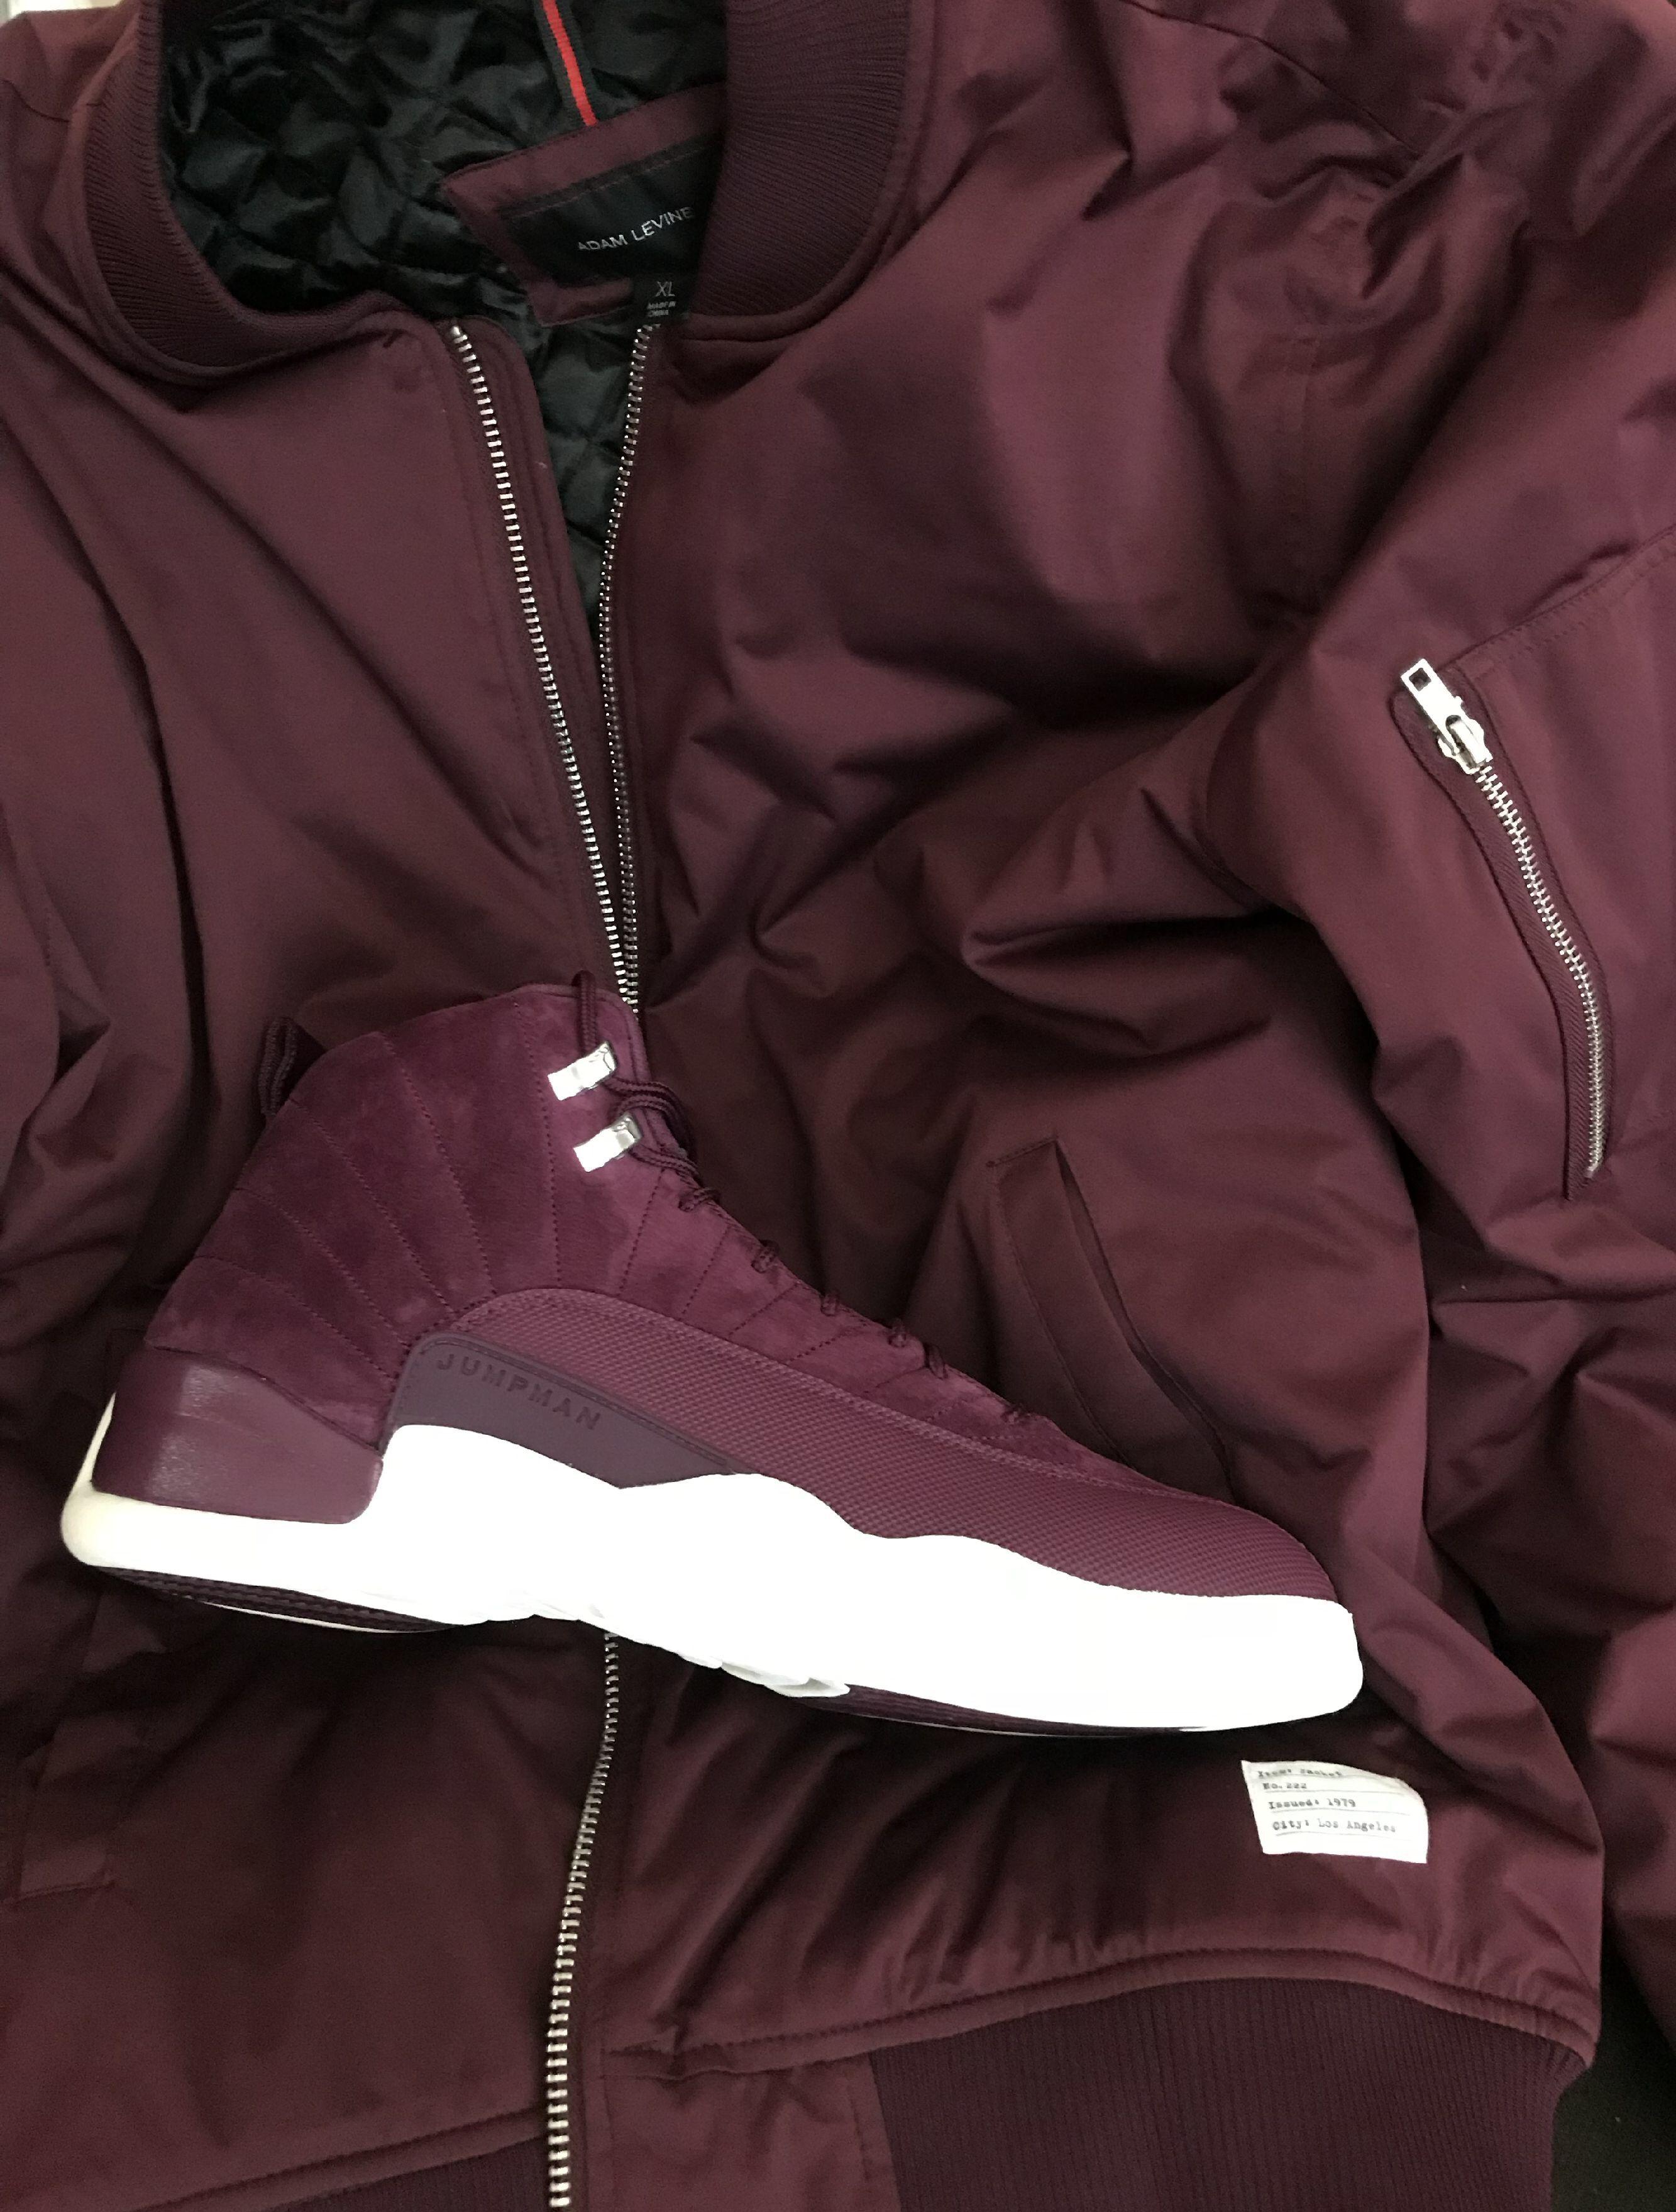 Jordan Retro 12 - Bordeaux.  kotd  fashion  picoftheday  jordan  retro   burgundy  silver f5a06fcc24b6